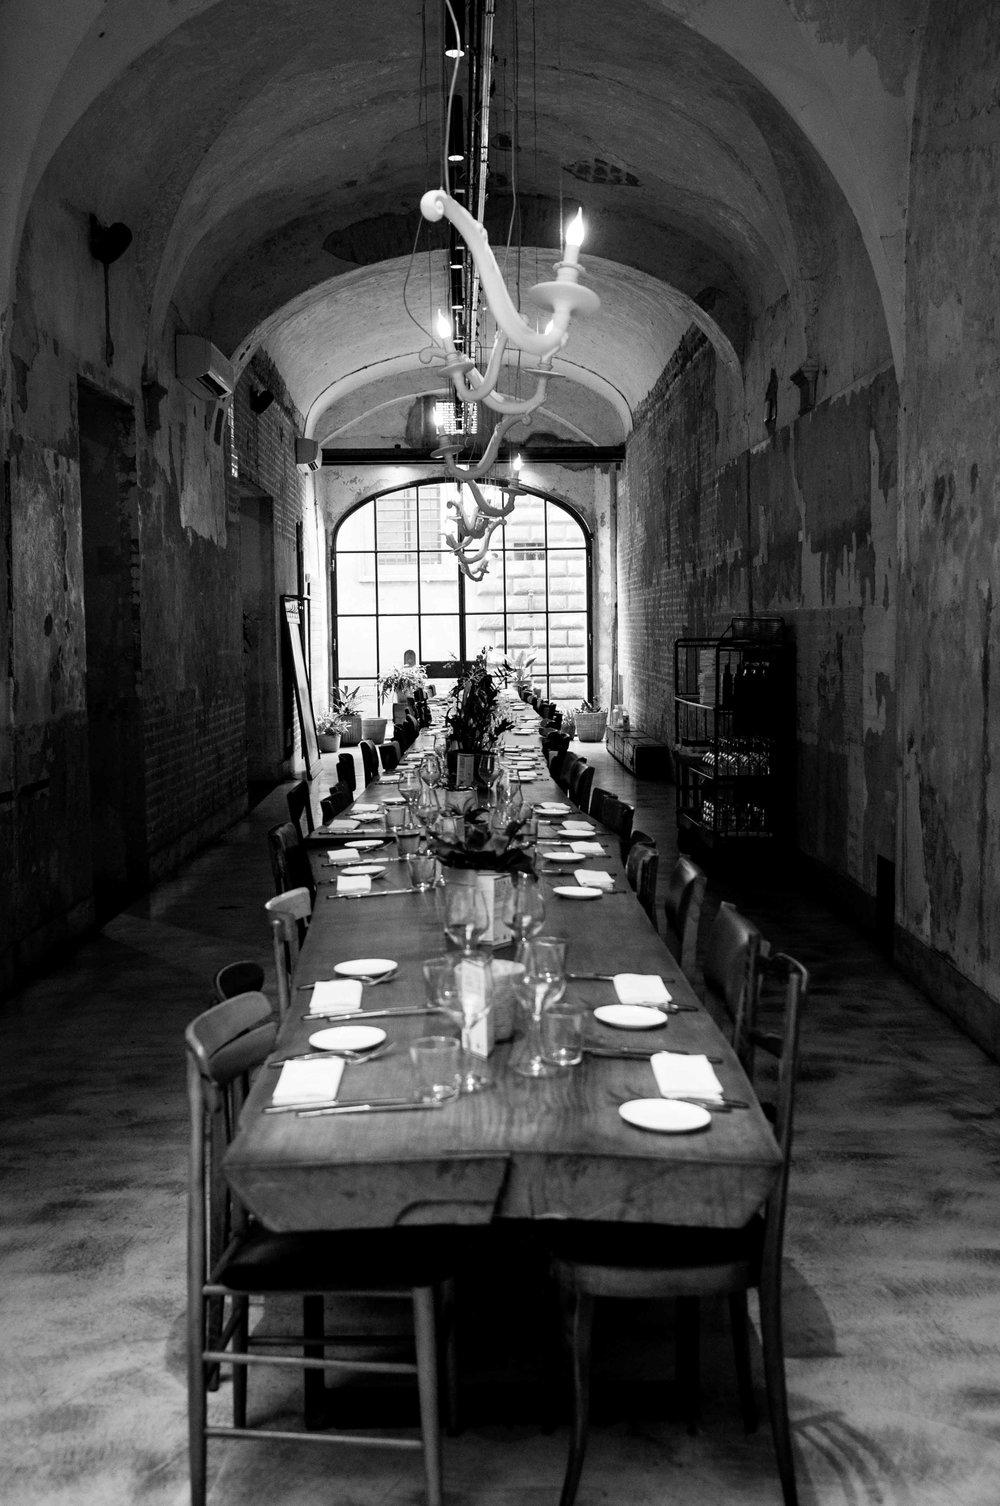 Florence-cafe-interiors.jpg